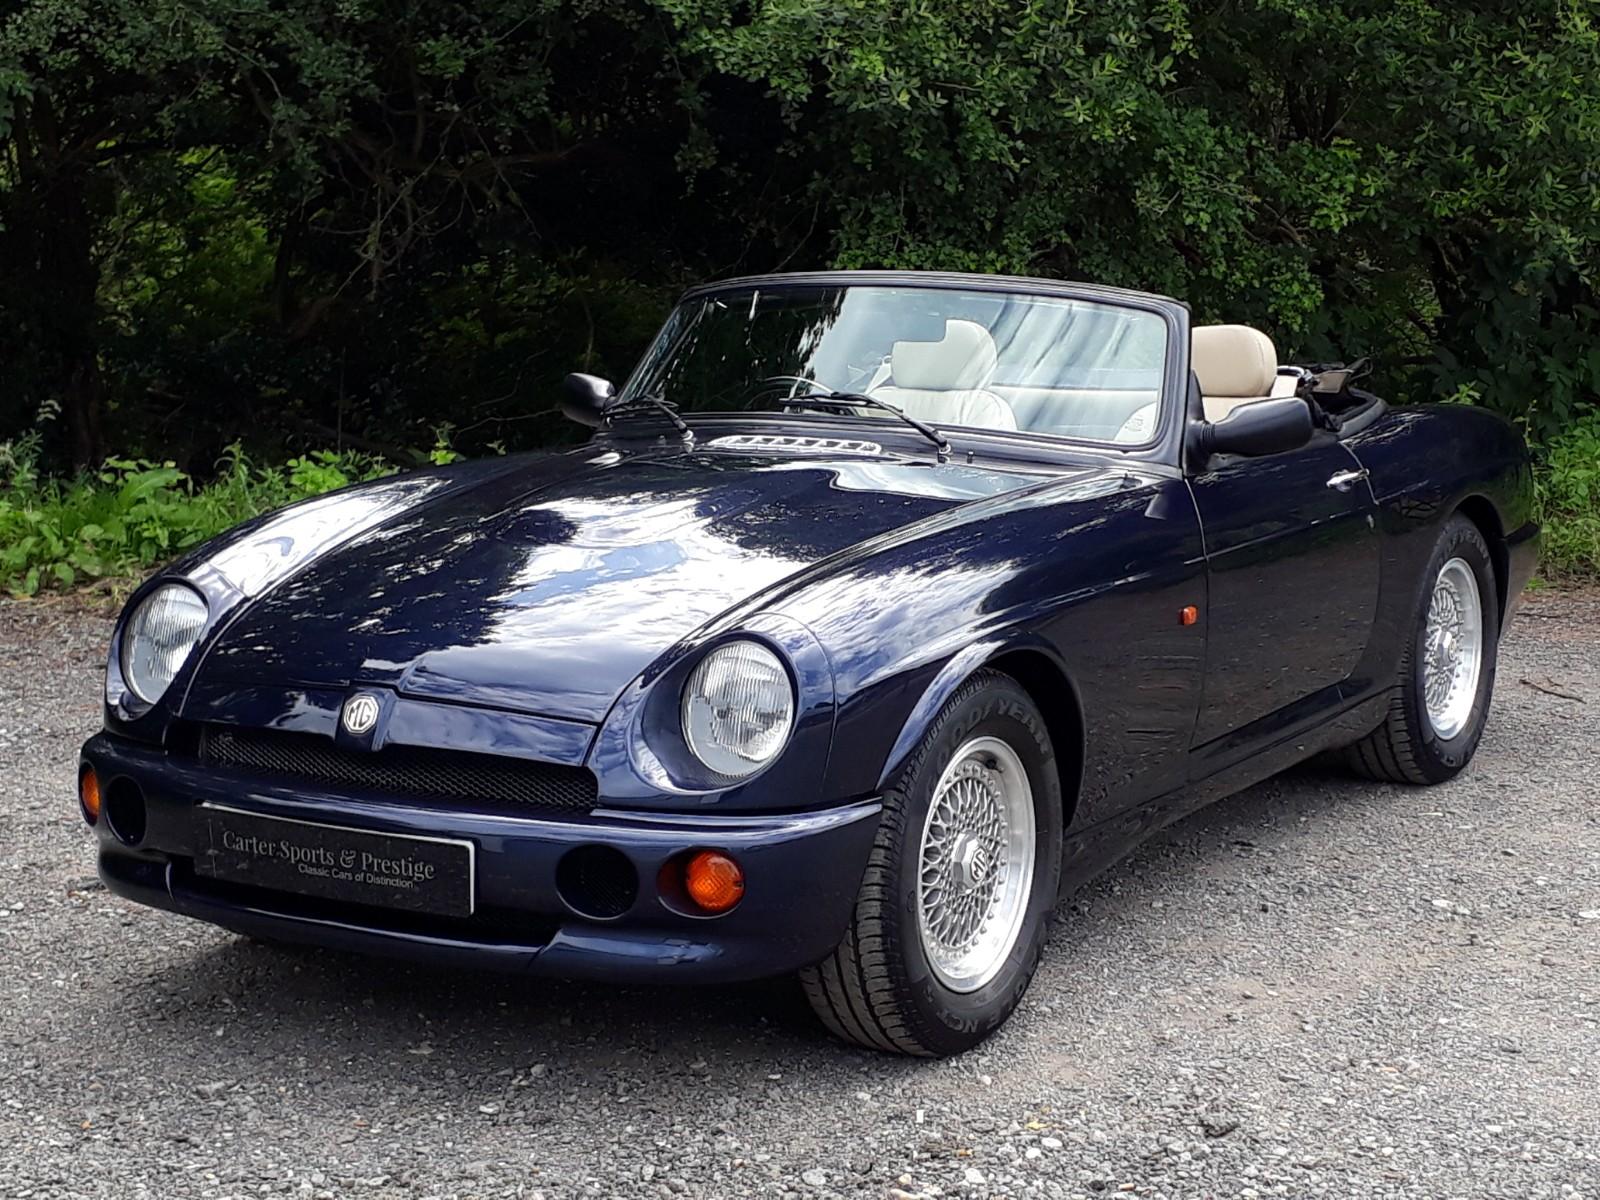 MG RV8 £19,995